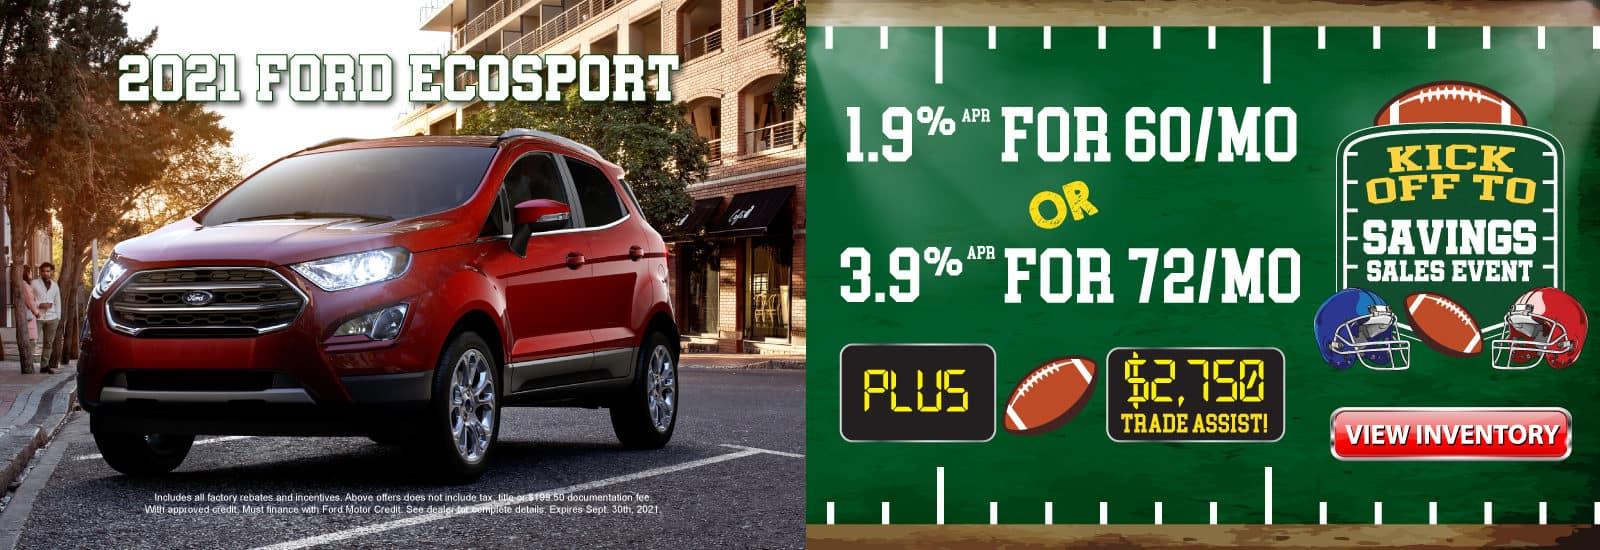 Sept2021-Ford-Ecosport-Web-Banner-1600×550